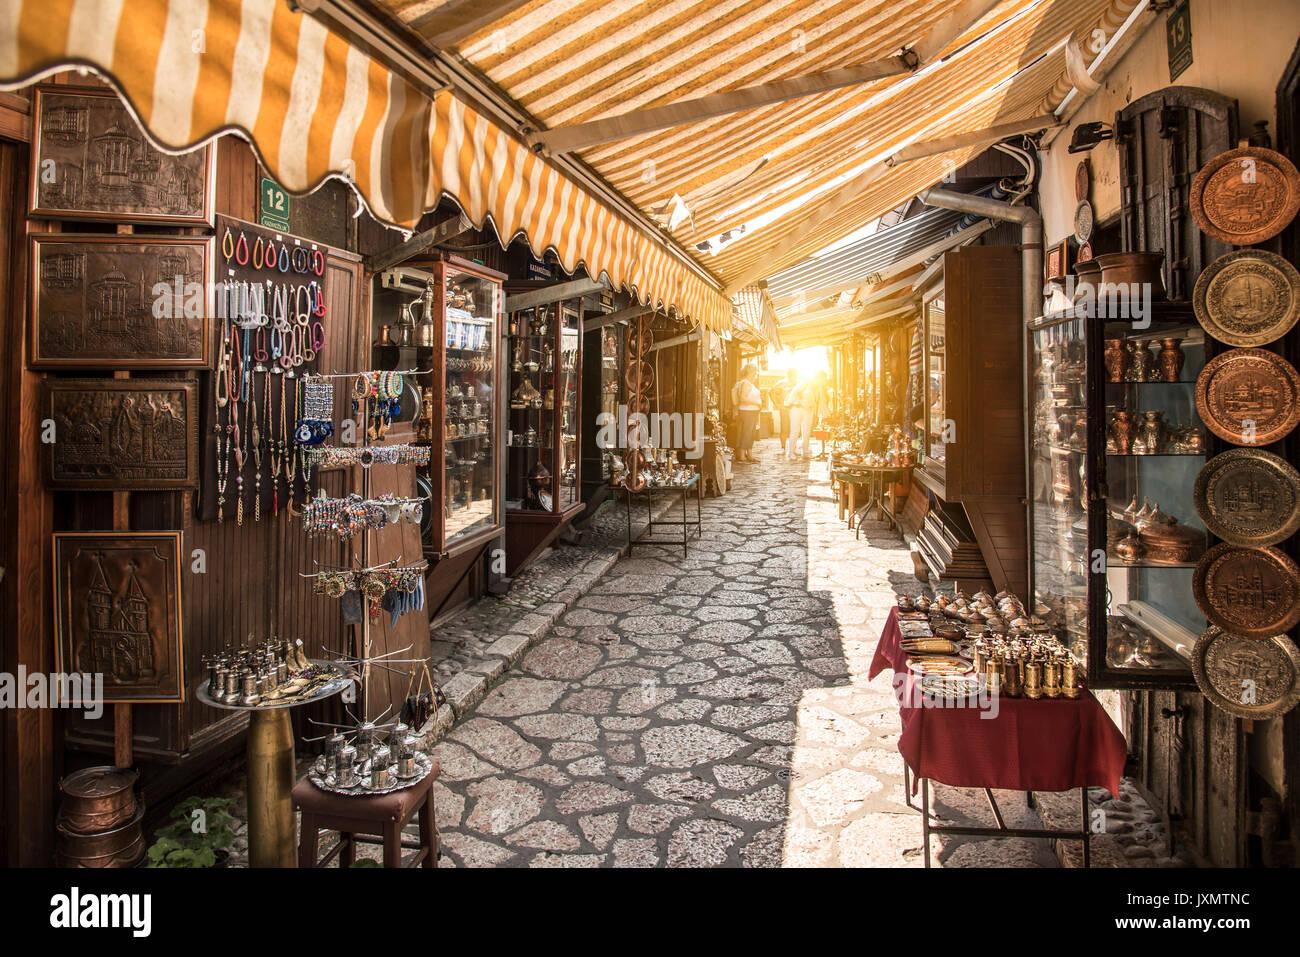 Market in the Old Town, Sarajevo, Bosnia and Herzegovina - Stock Image